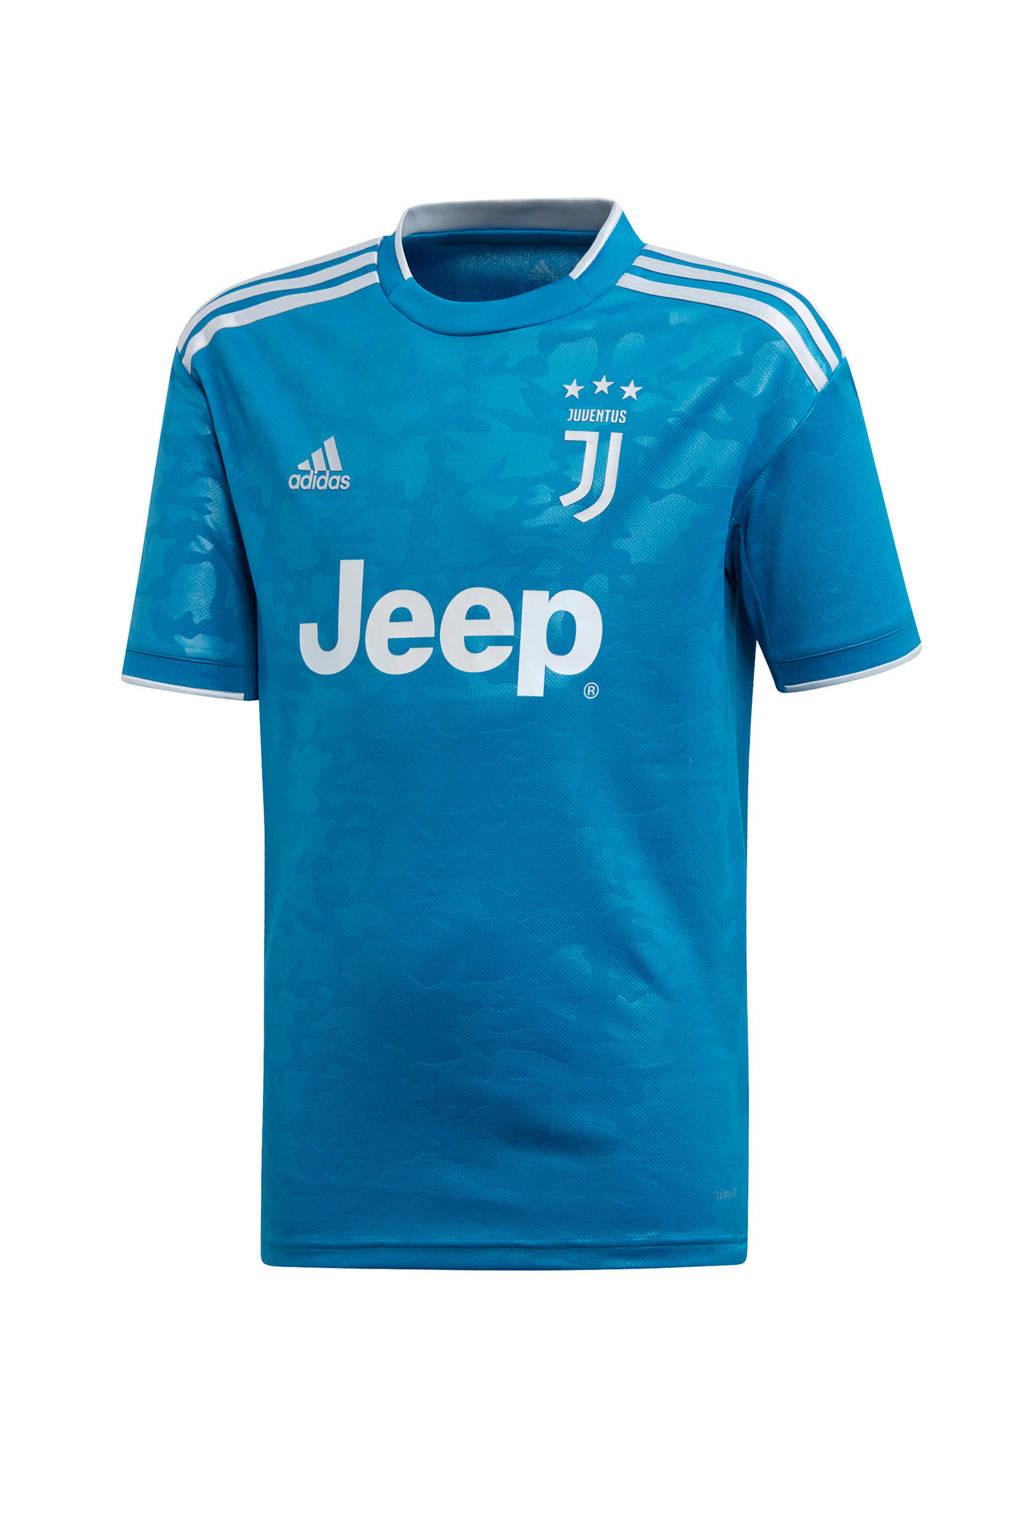 adidas performance Junior Juventus voetbalshirt, Jongens/meisjes